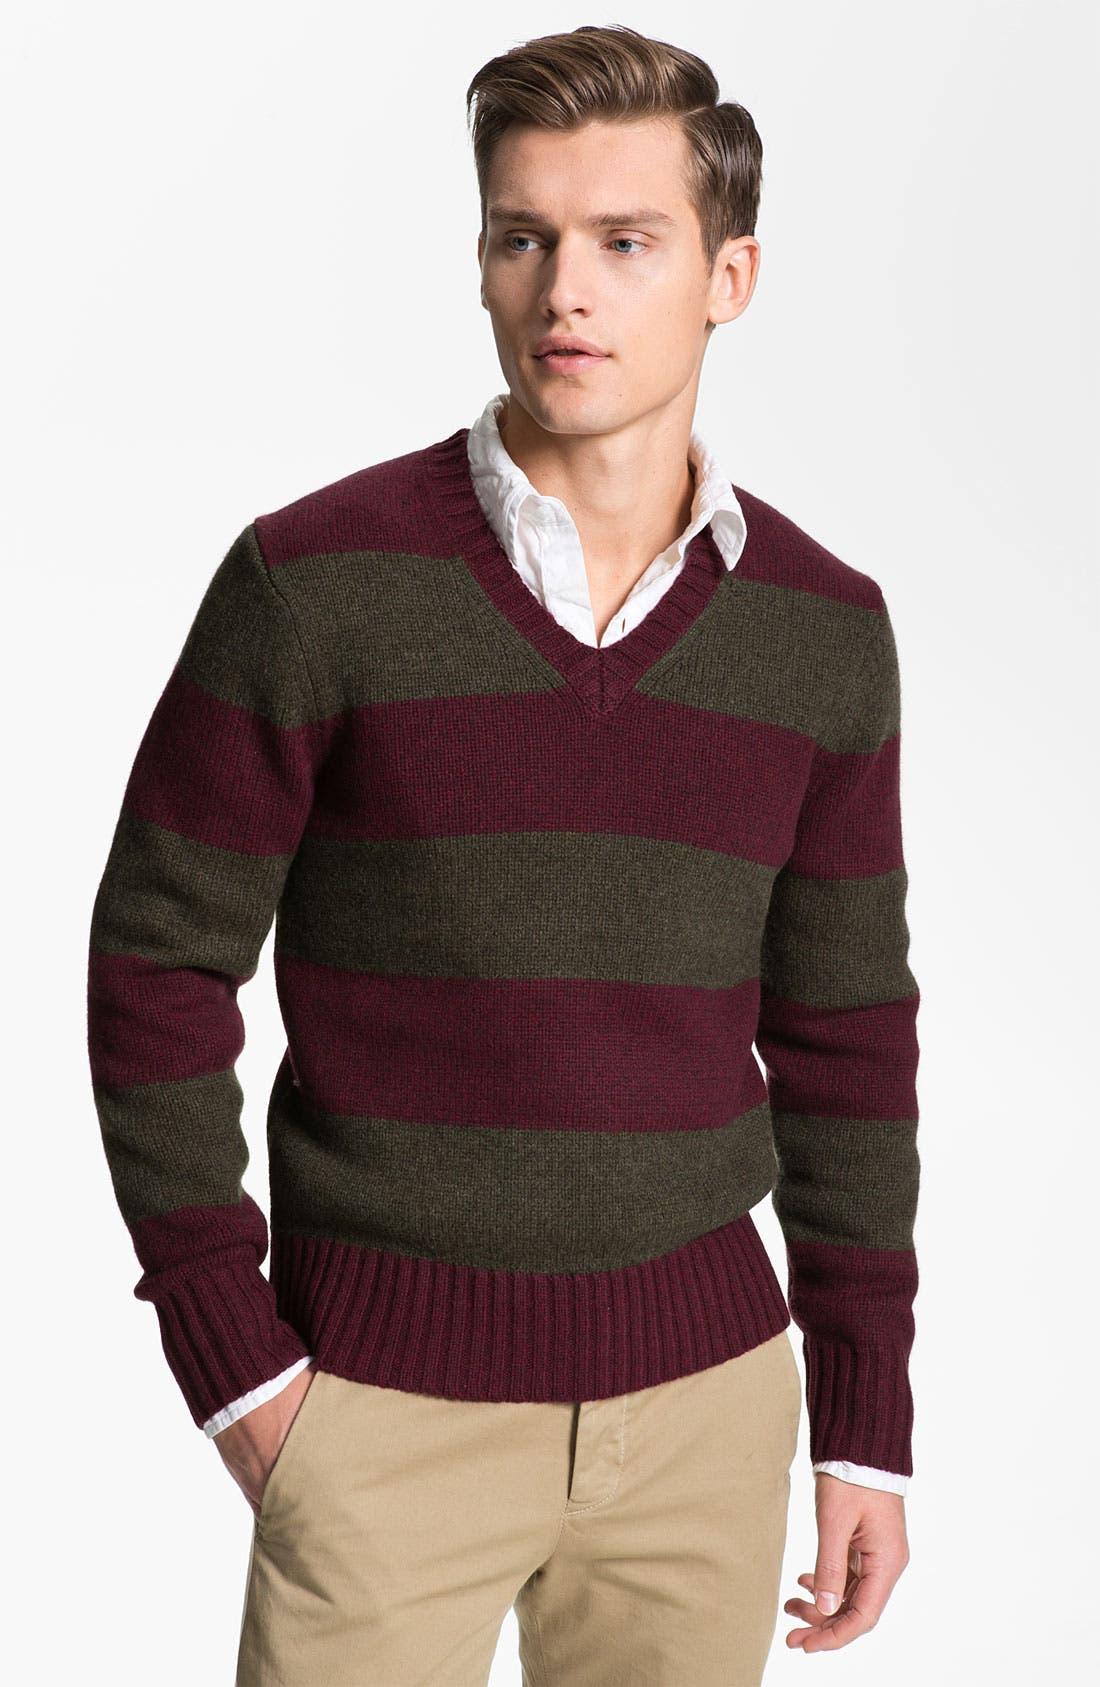 Alternate Image 1 Selected - Jack Spade 'Gibson' V-Neck Sweater